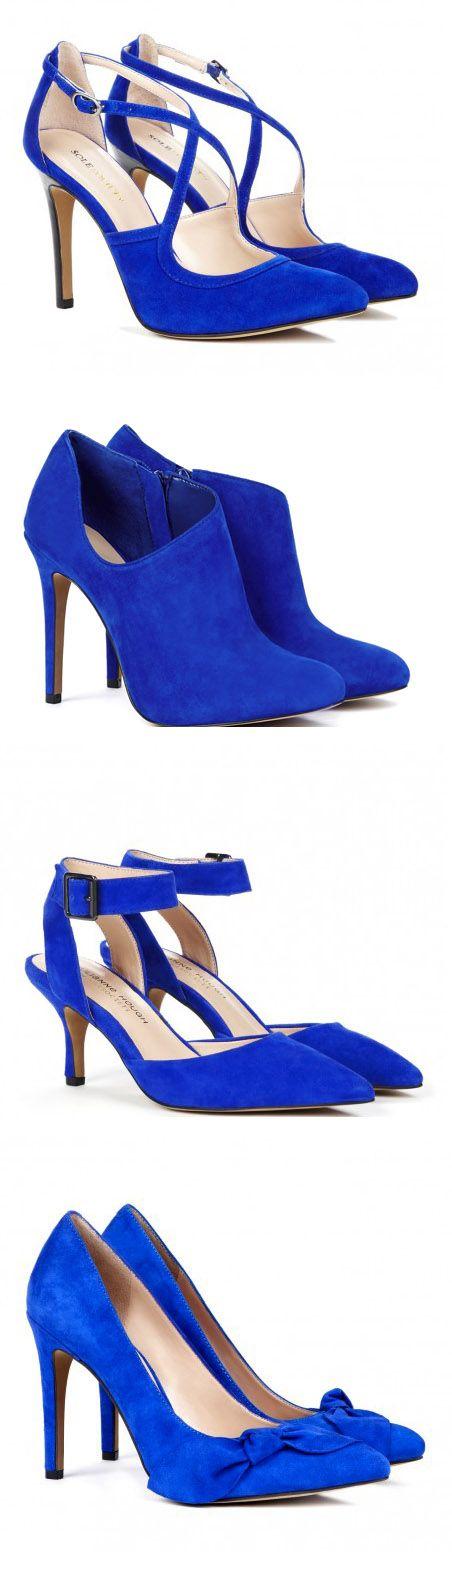 Electric Blue : my favourite colour.  :)